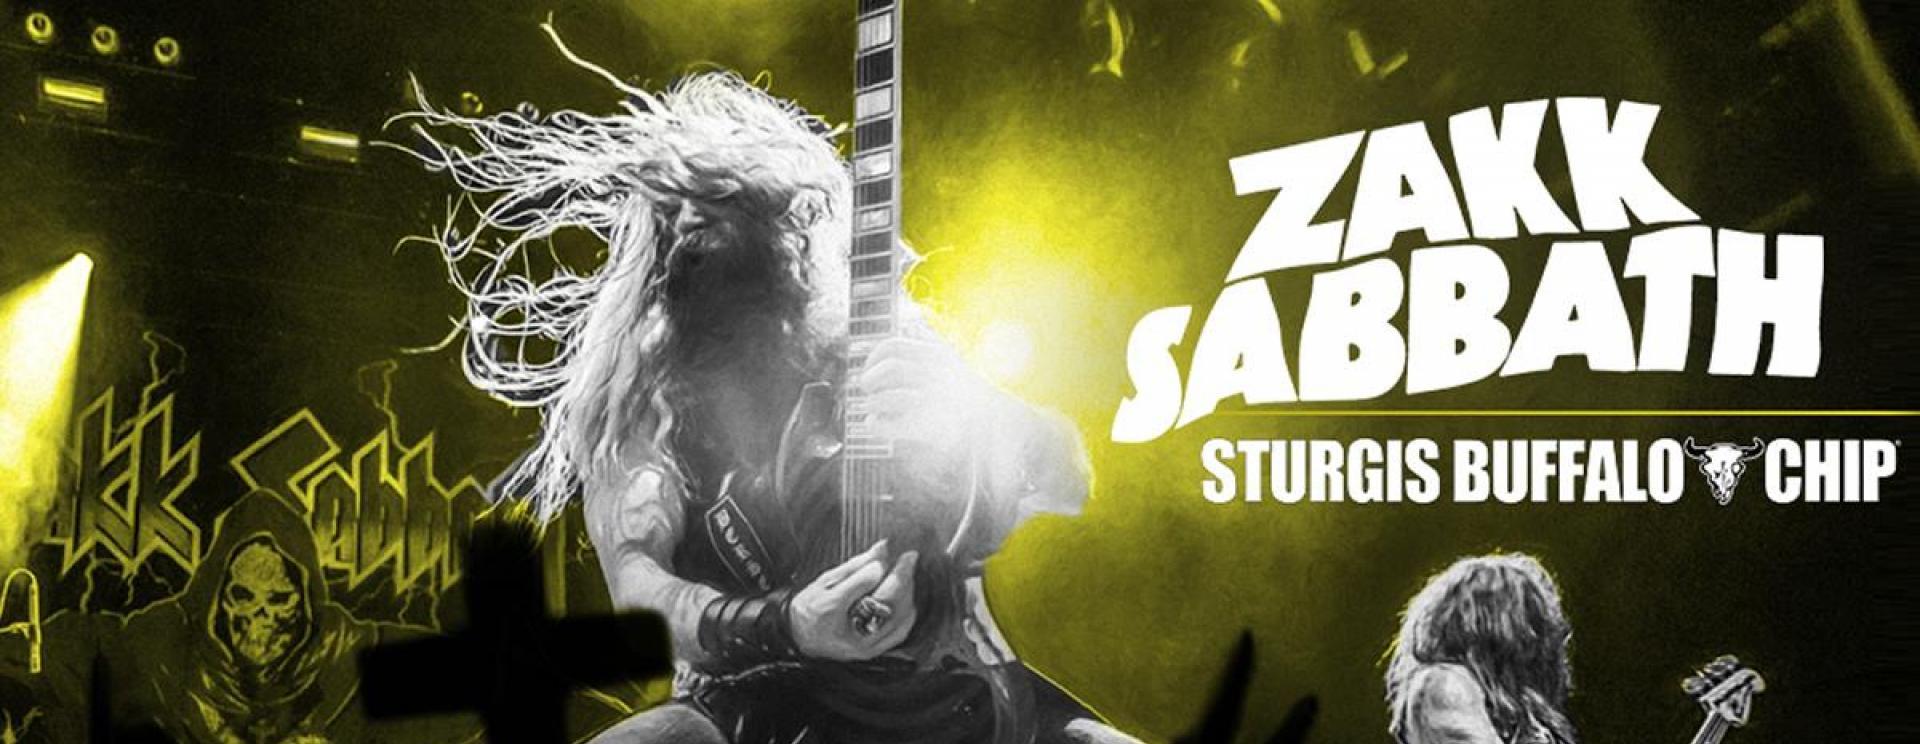 Zakk Sabbath in Concert